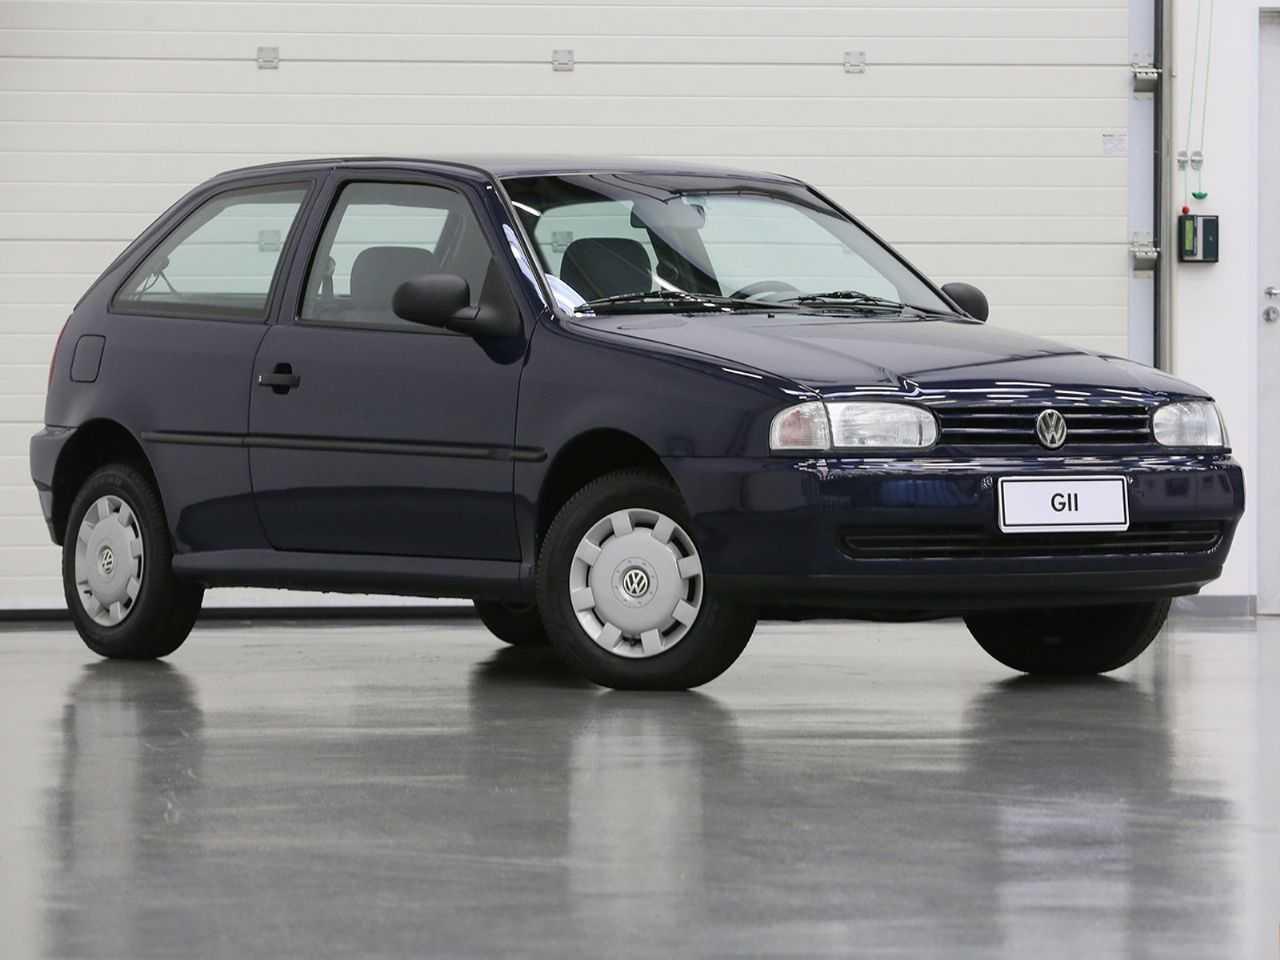 VolkswagenGol 1995 - ângulo frontal